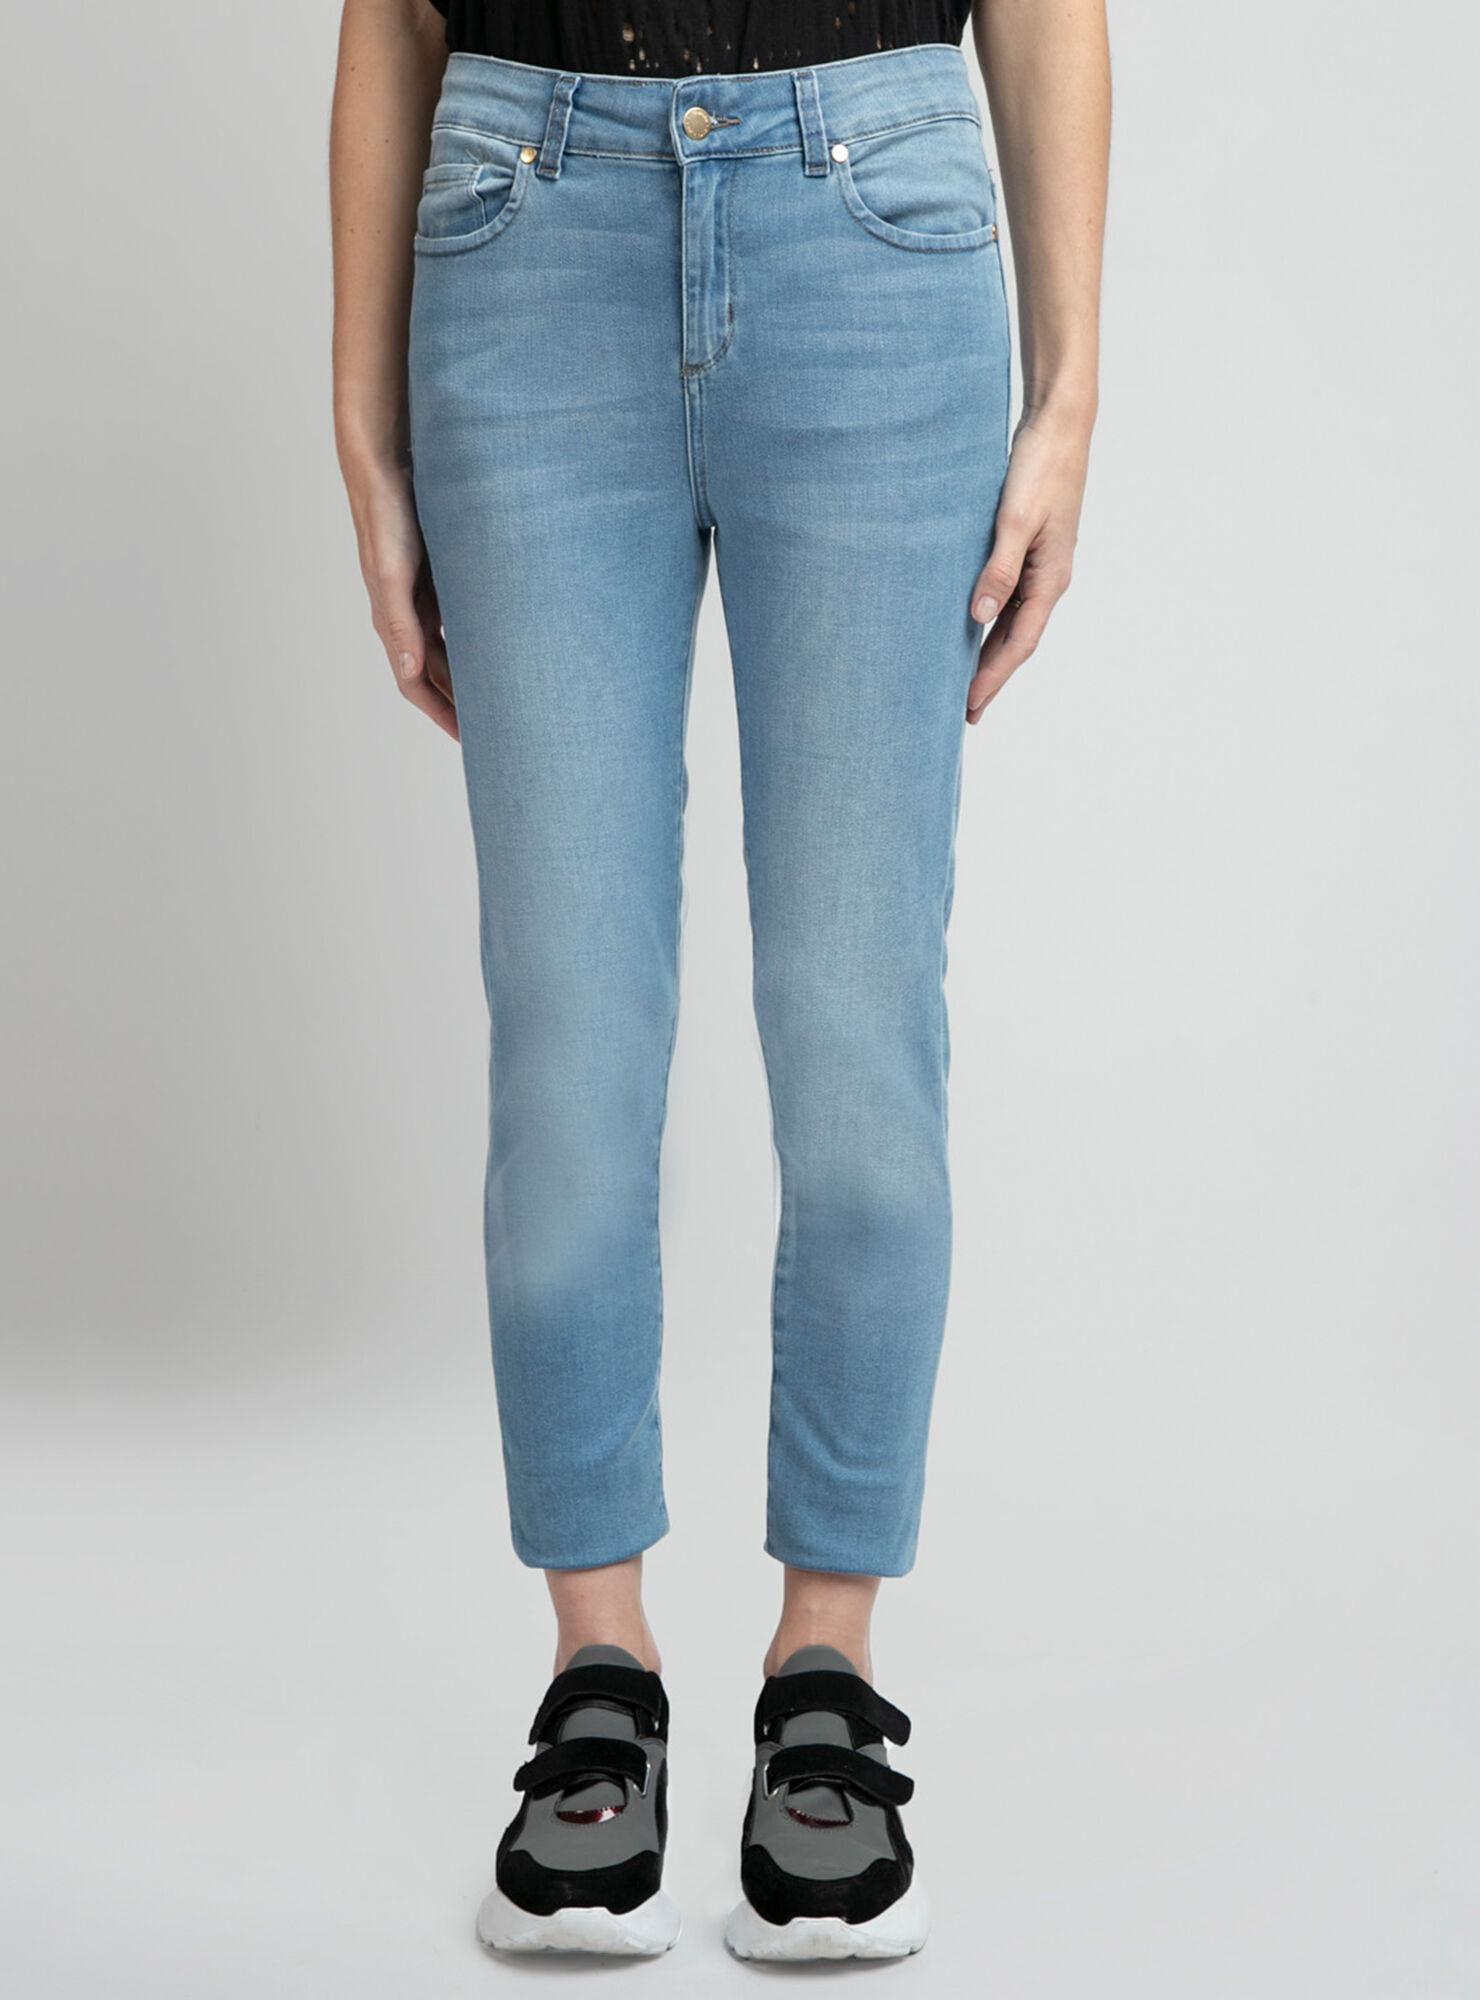 0c00934d42 Jean Liverpool Artico Vitamina - Jeans